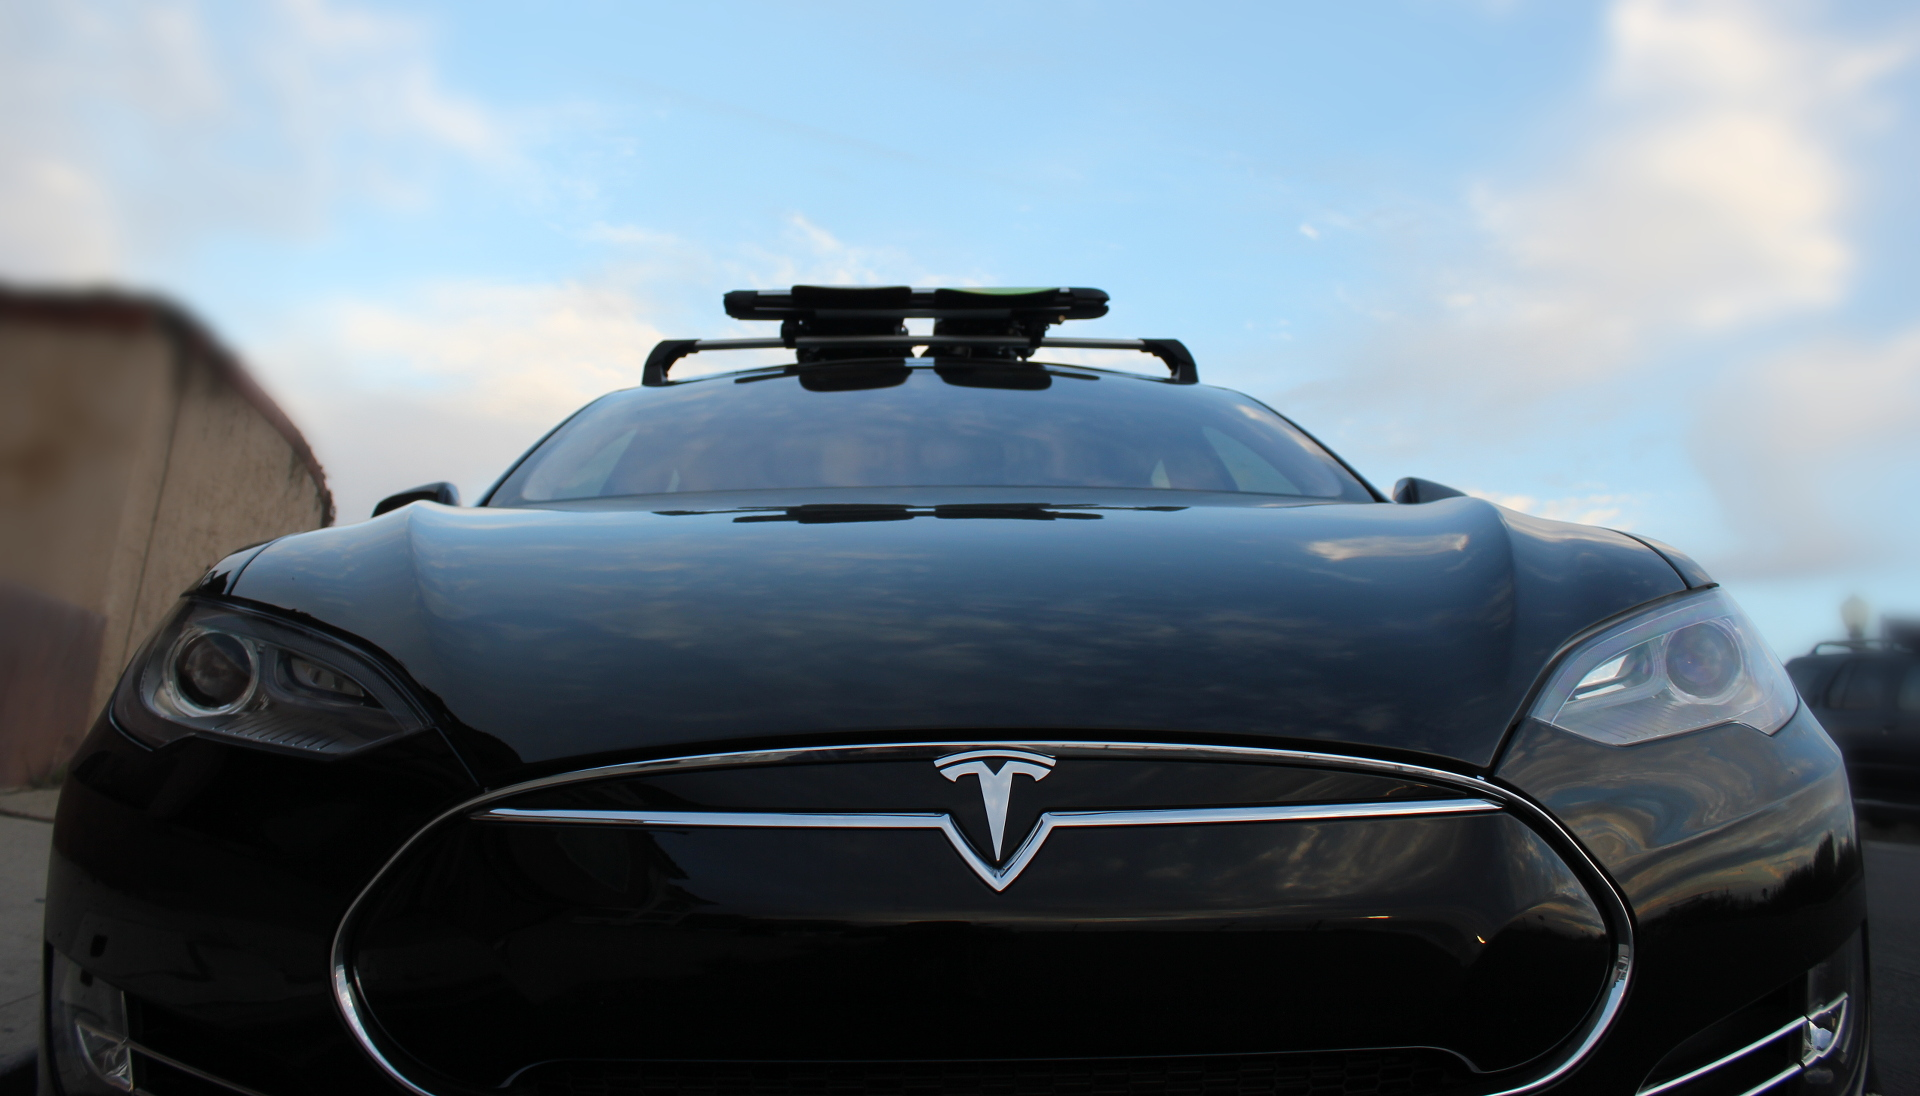 Tesla-Model-S-Whispbar-Roof-Rack-3